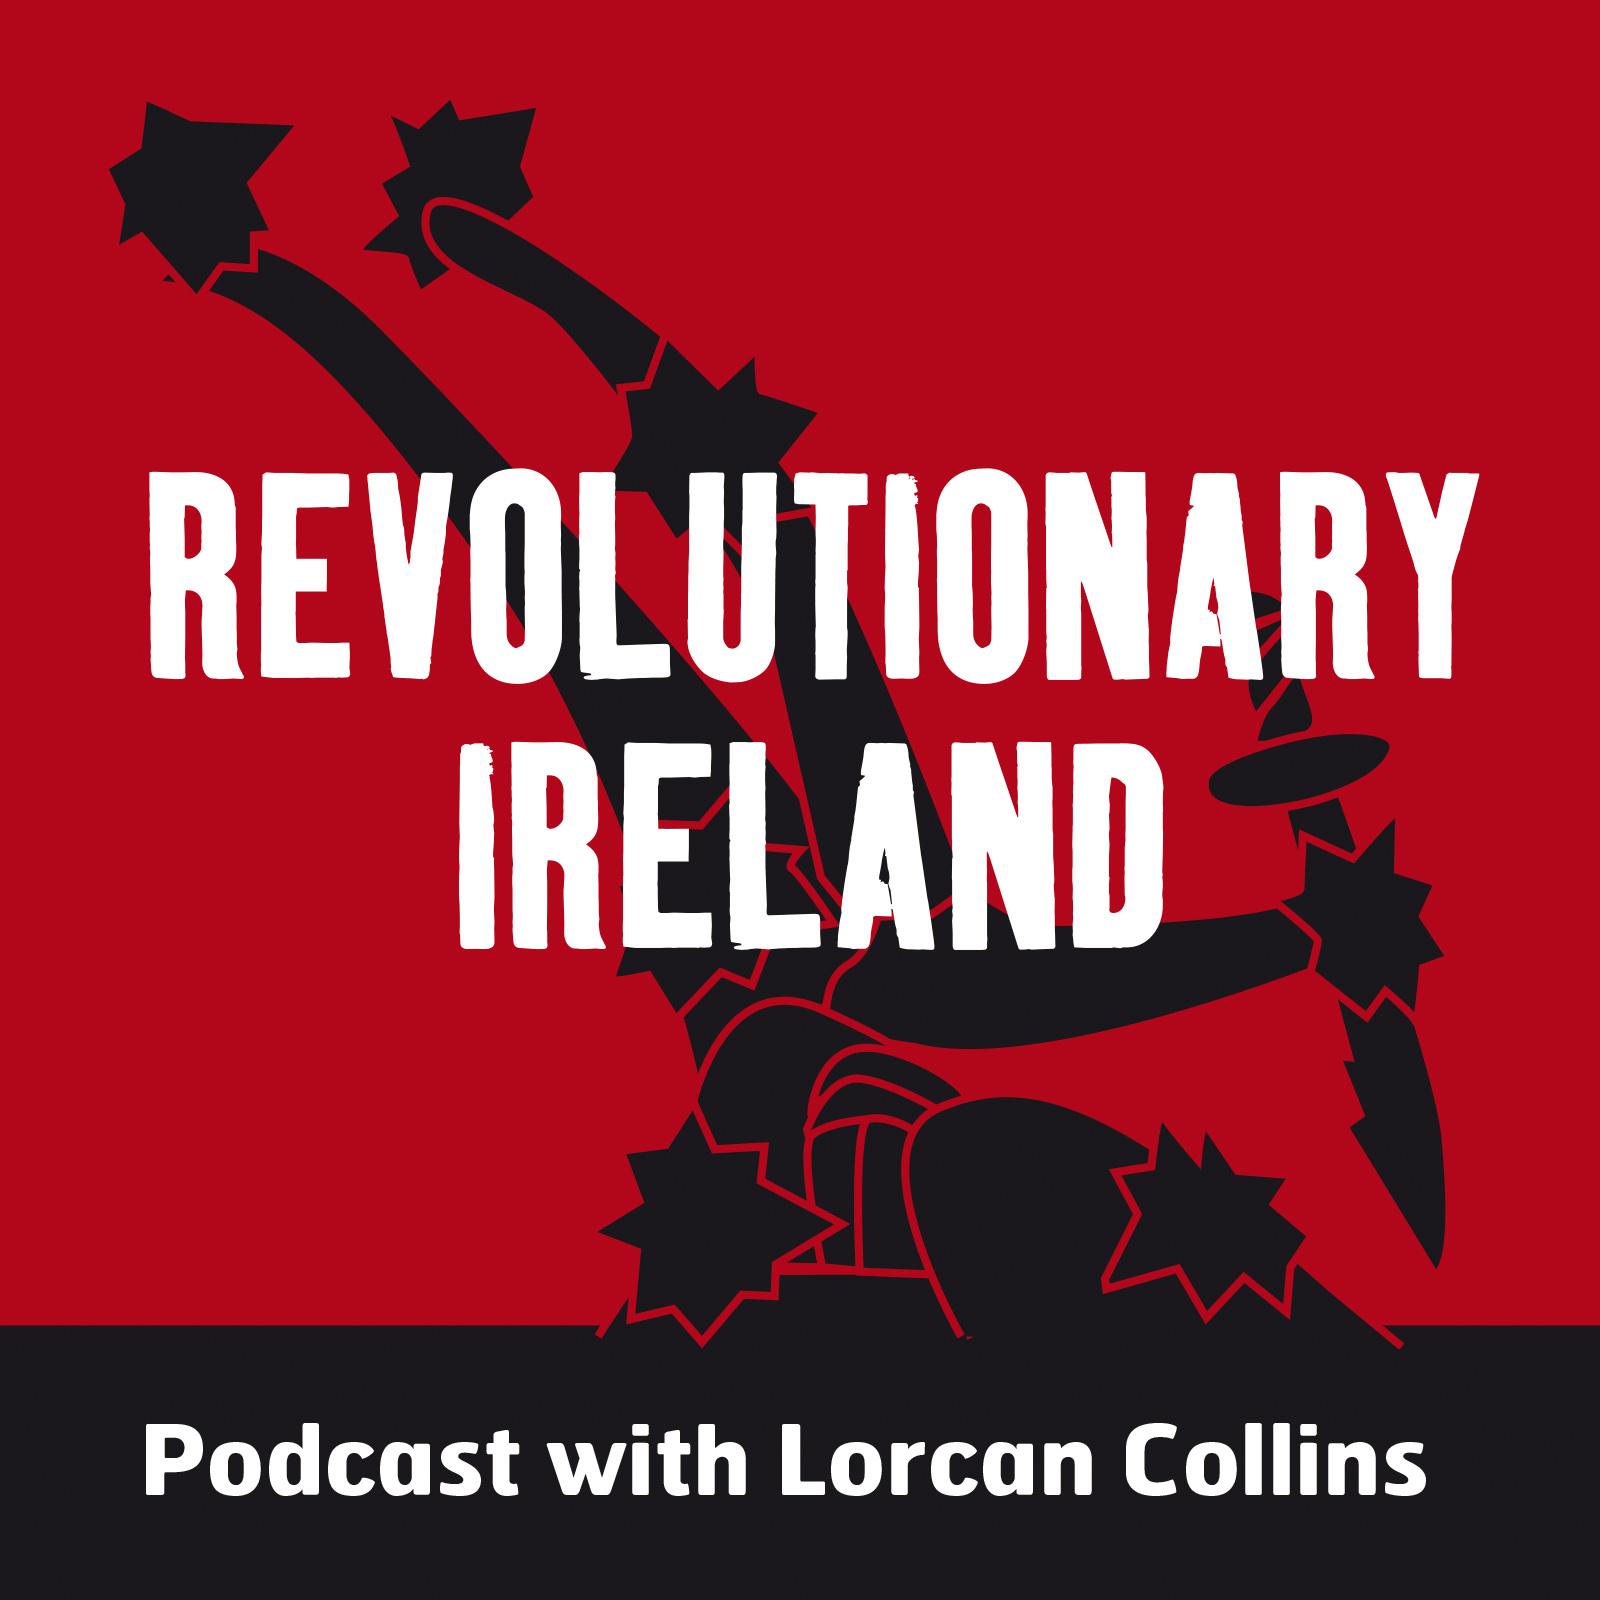 Revolutionary Ireland show art